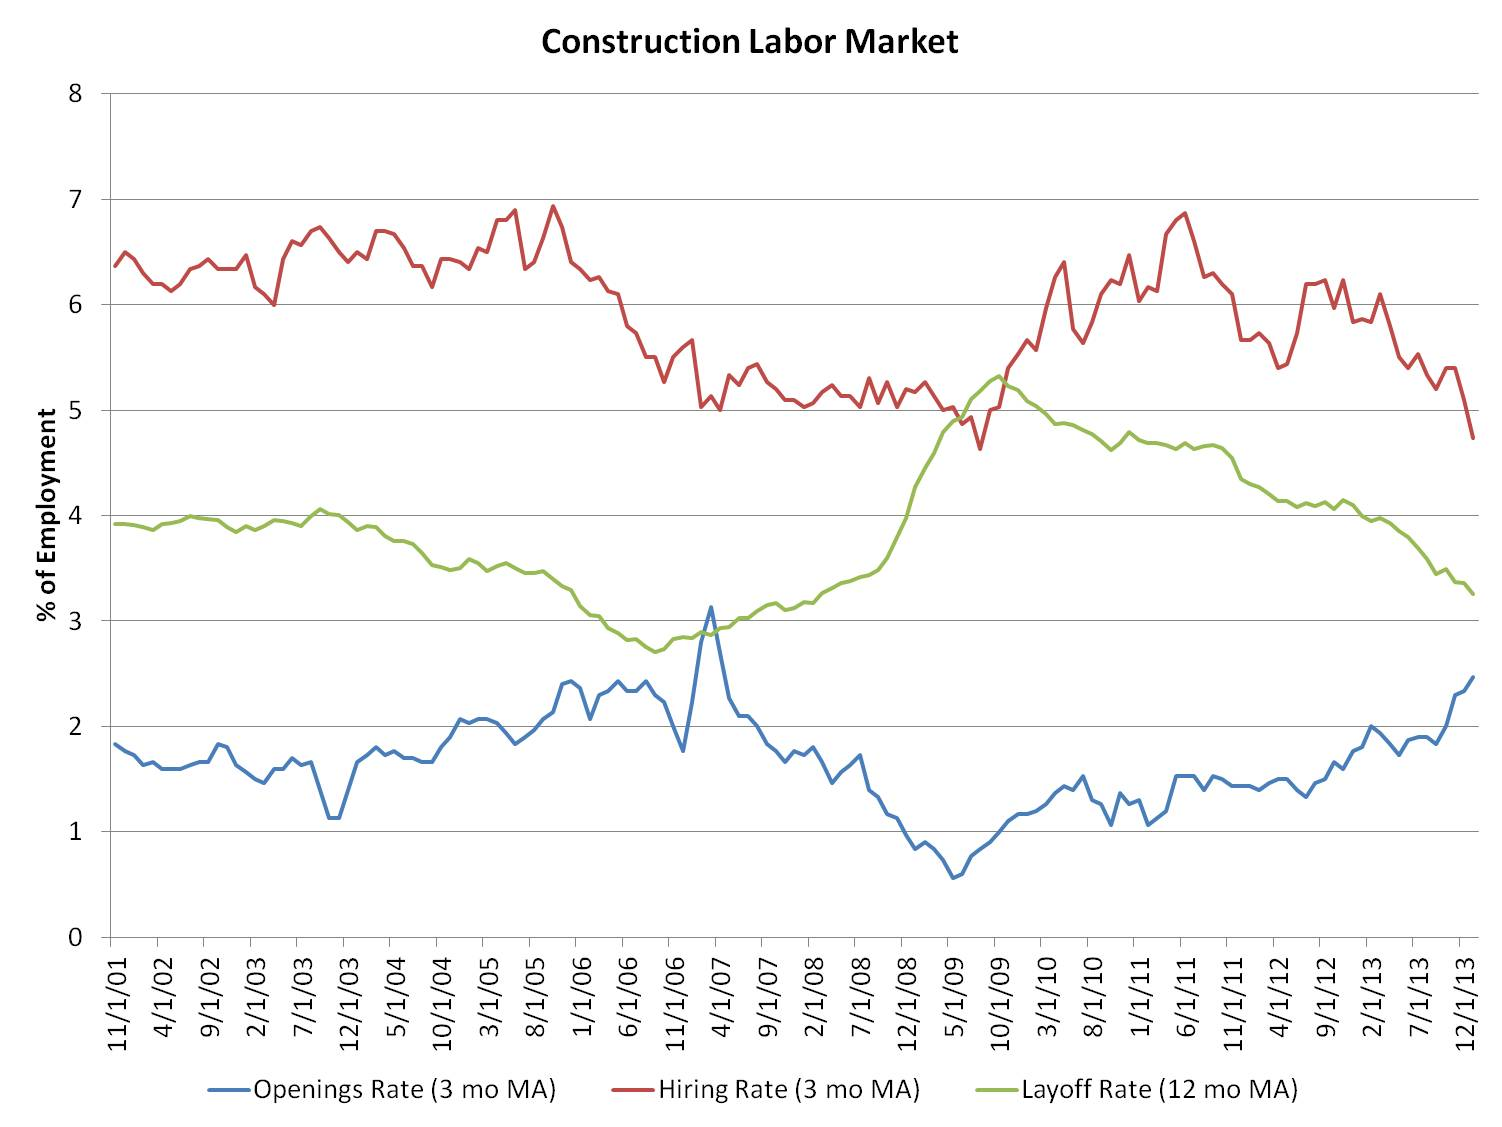 cosntr labor market